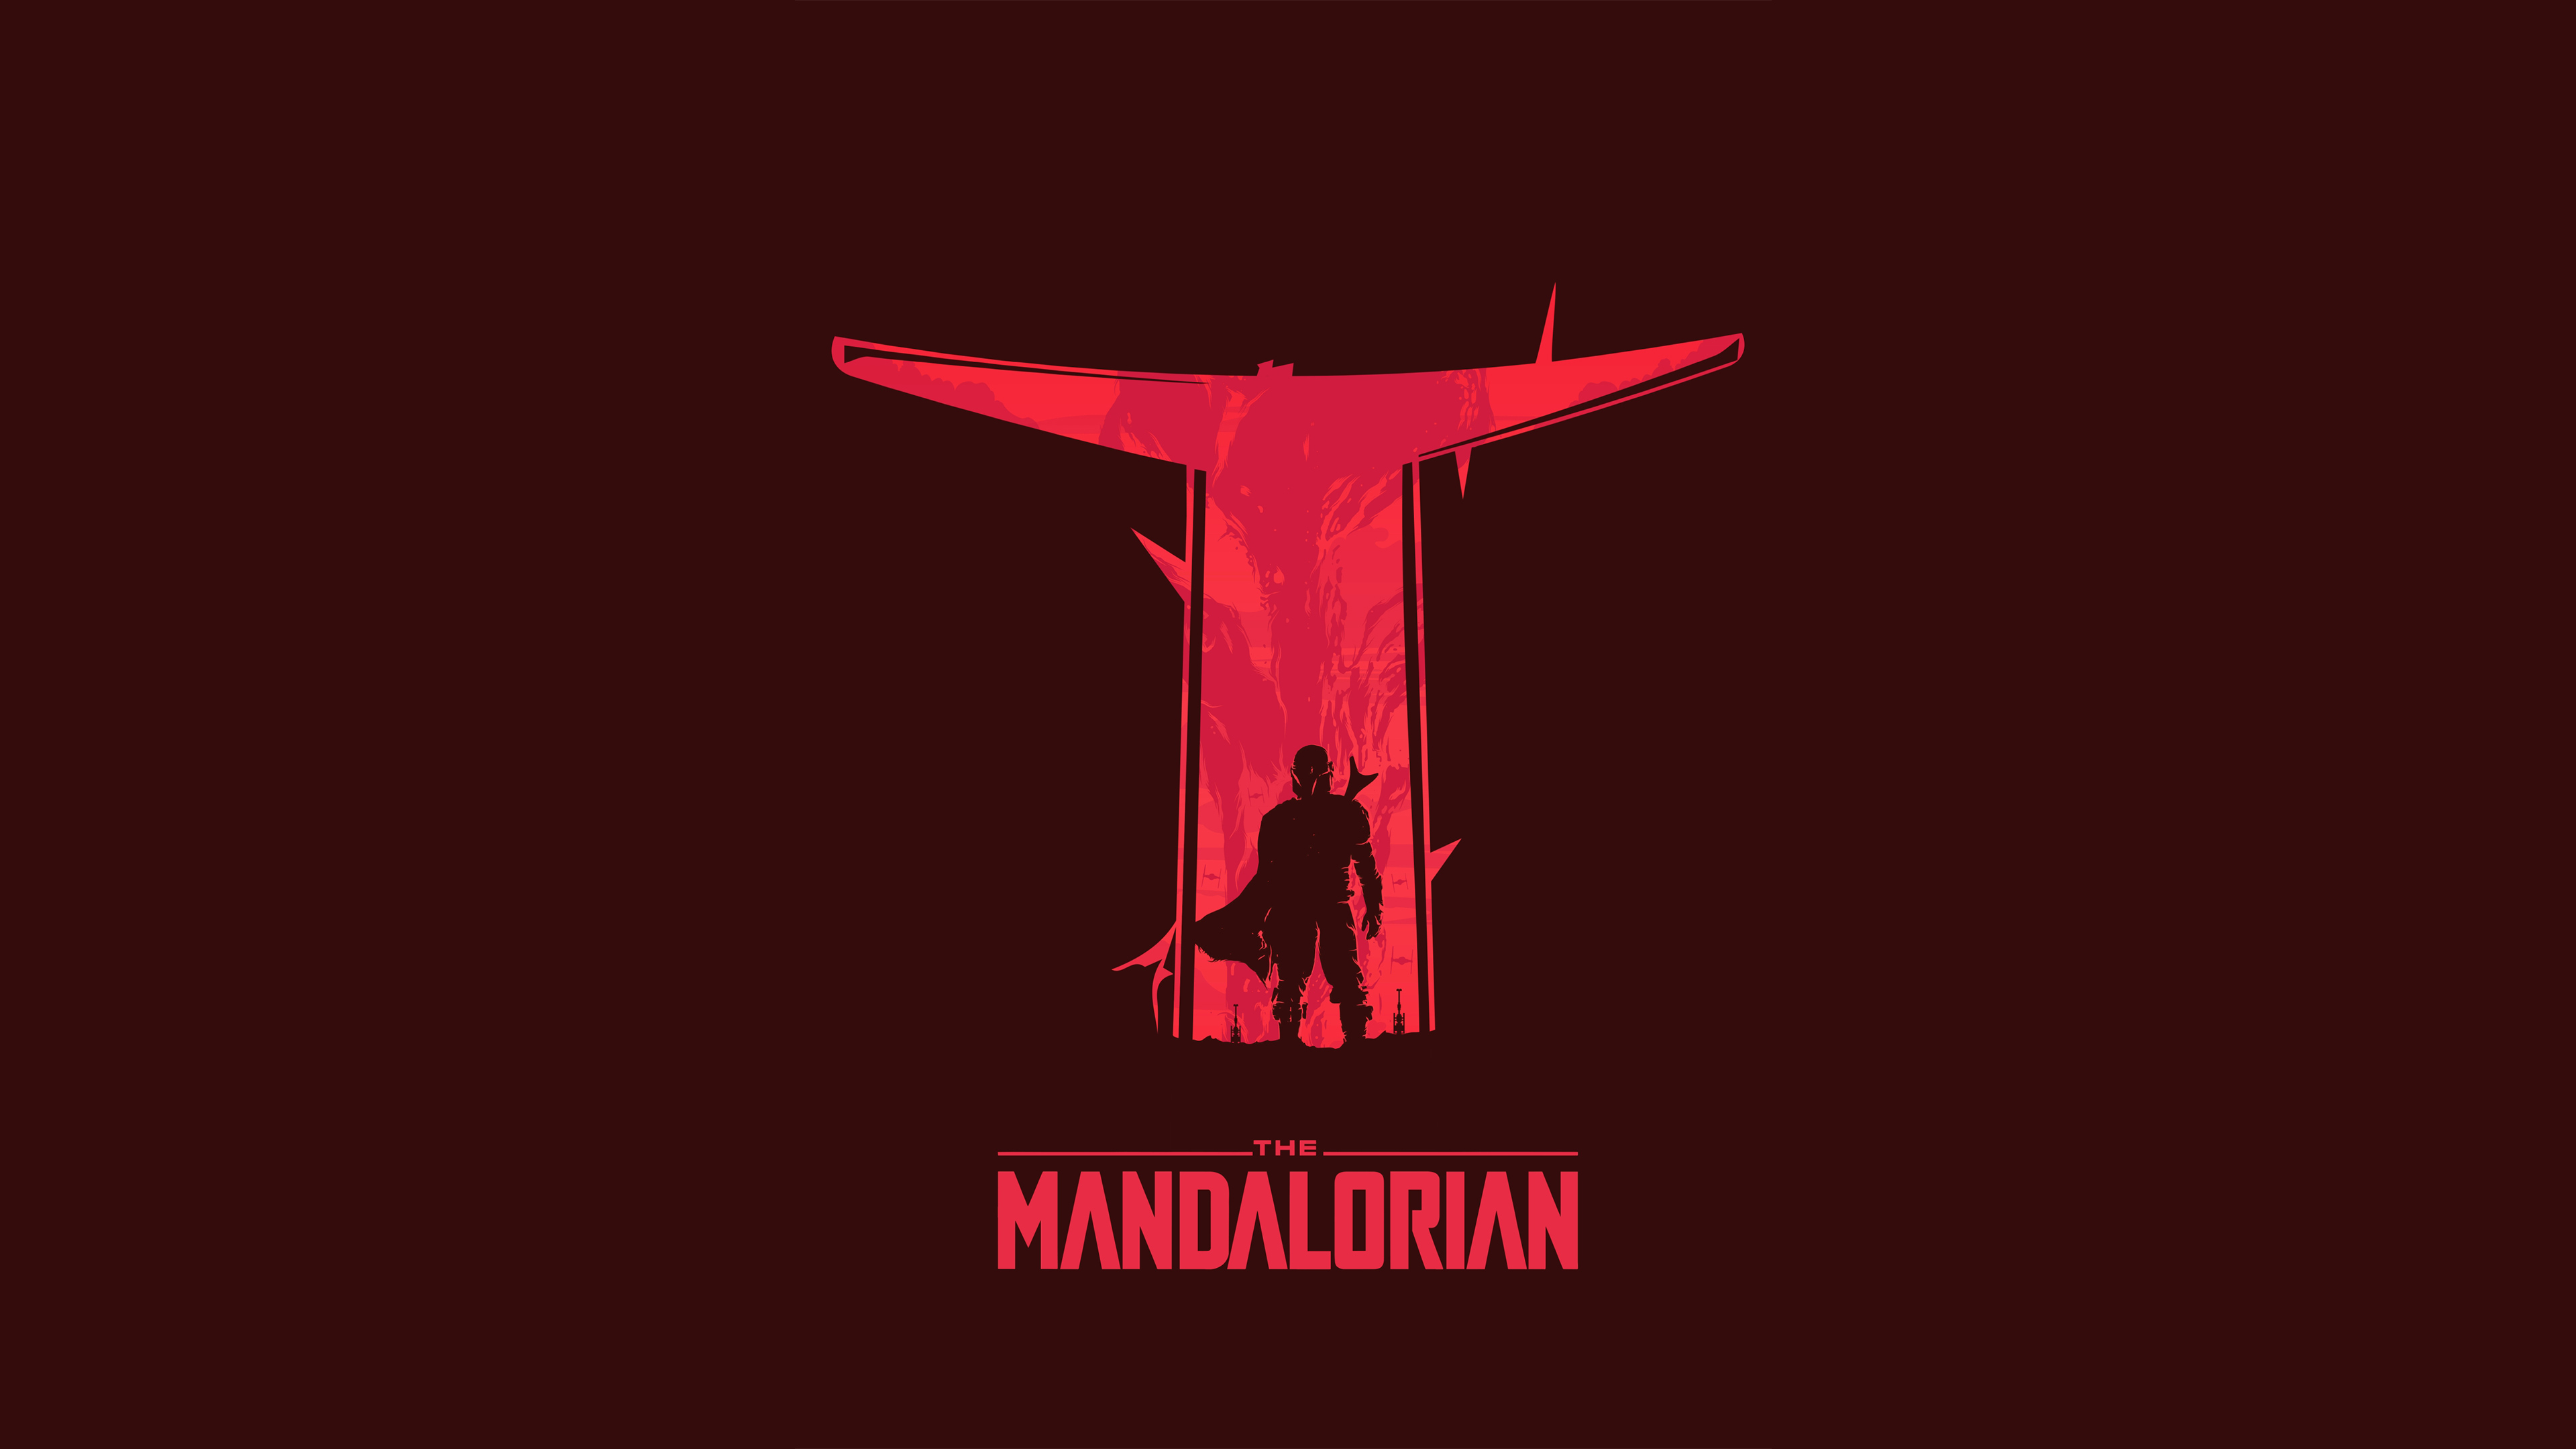 the mandalorian art 1578252528 - The Mandalorian Art - The Mandalorian Art 4k wallpaper